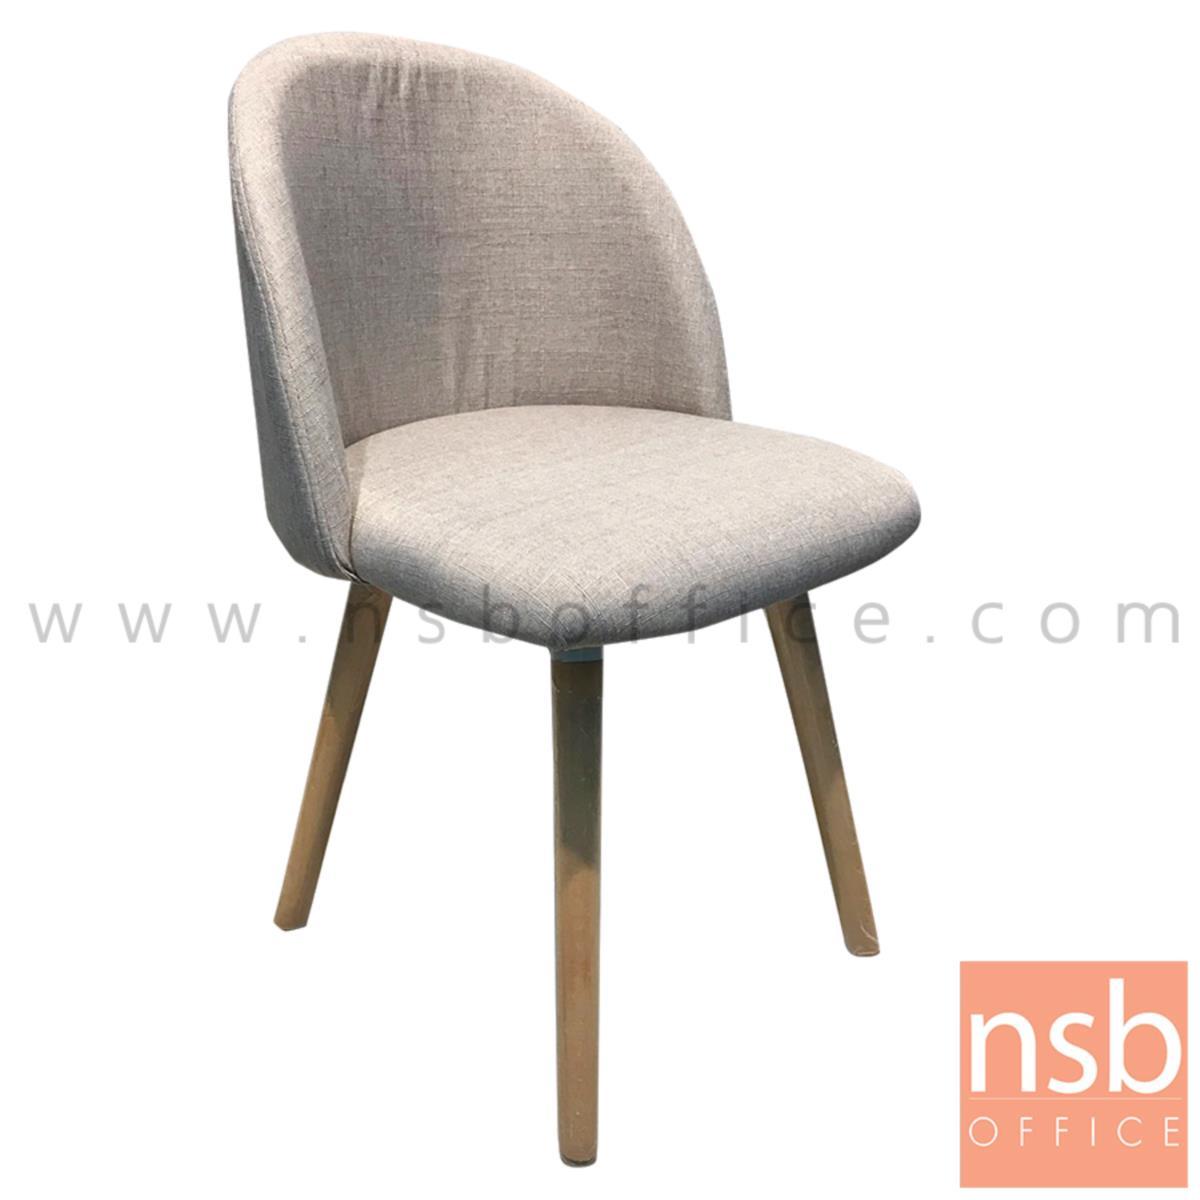 B29A315:เก้าอี้โมเดิร์นหุ้มผ้า รุ่น SF-3155 ขนาด 48W cm. โครงขาไม้